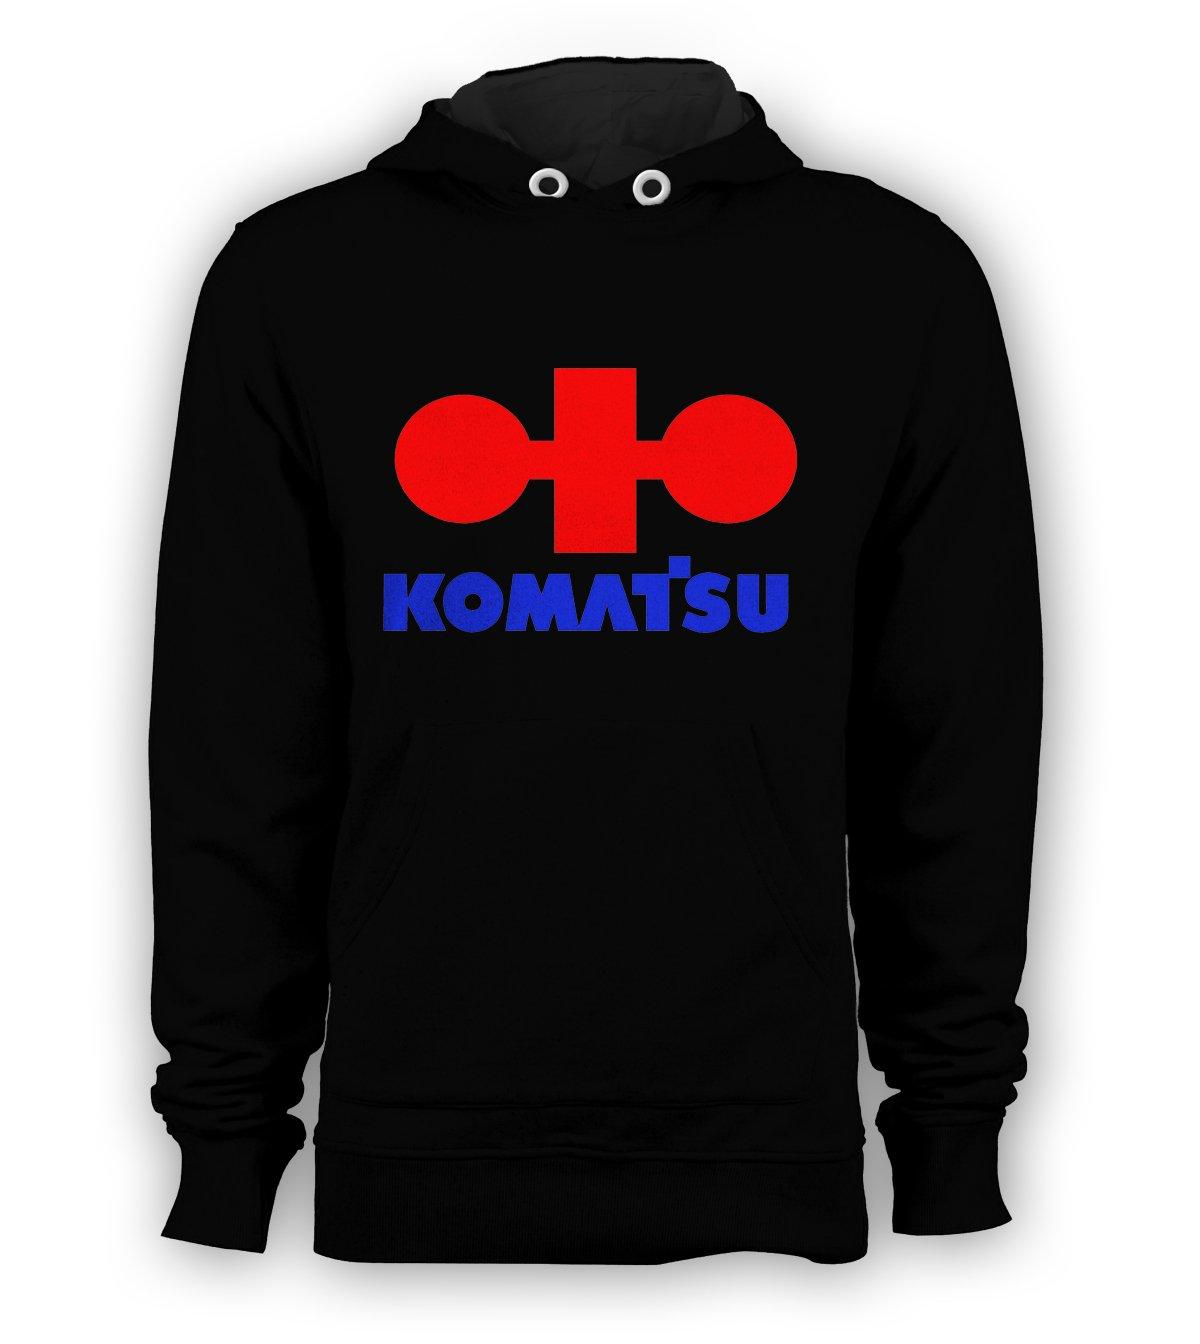 Komatsu Logo Pullover Hoodie Men Sweatshirts Size S to 3XL New Black